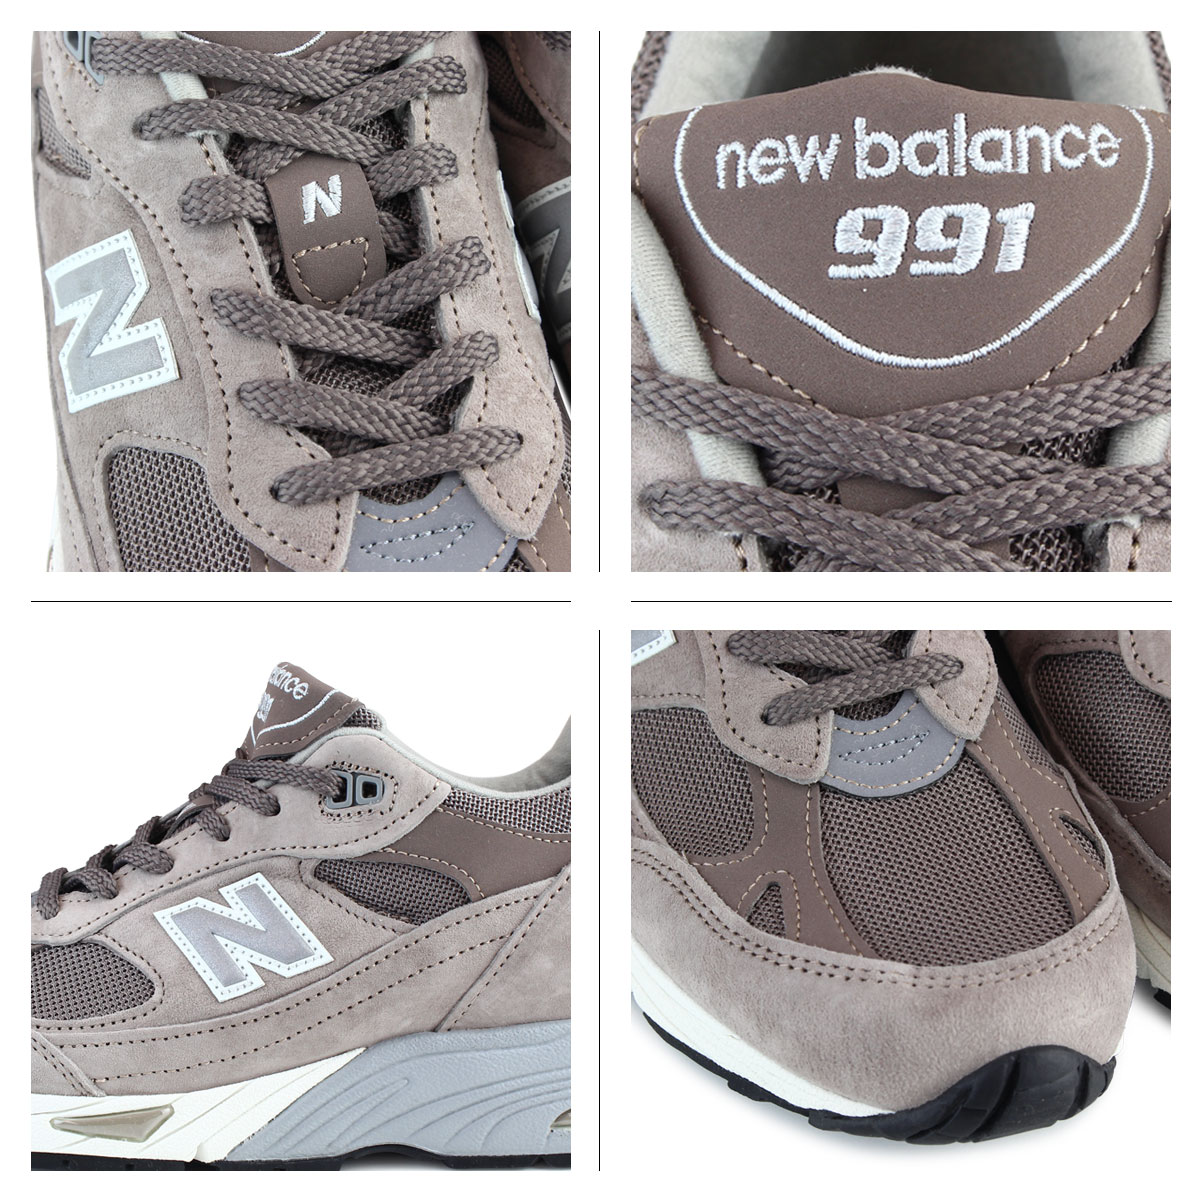 new balance 991 estate